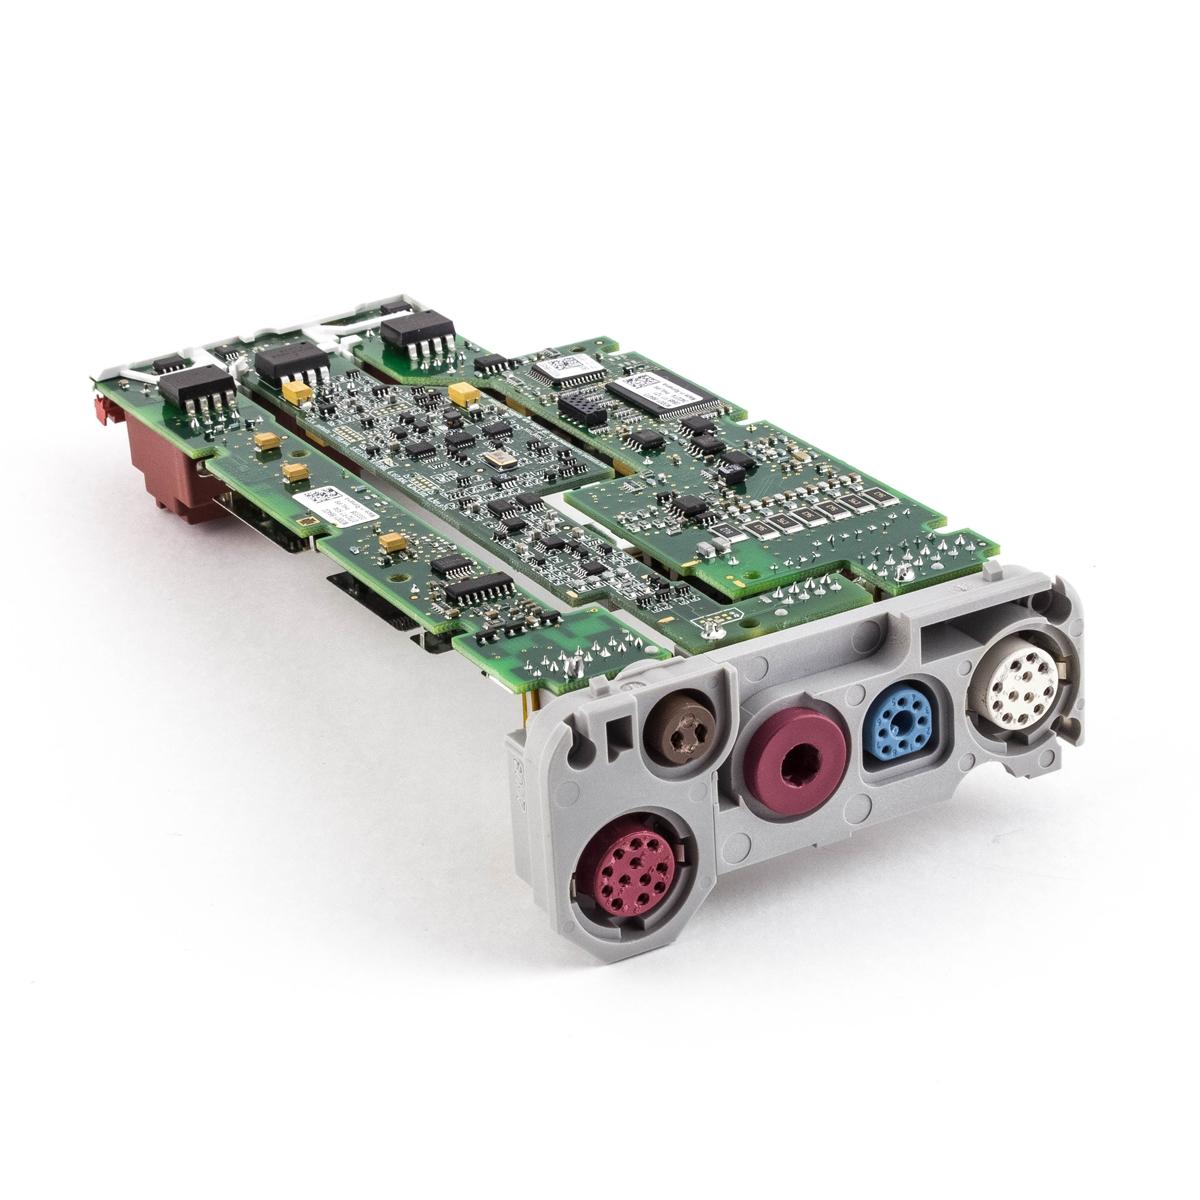 Philips IntelliVue X2 MP2 Parameter Boards A03C18 Masimo SET SpO2 12 Lead ECG IBP & Temp